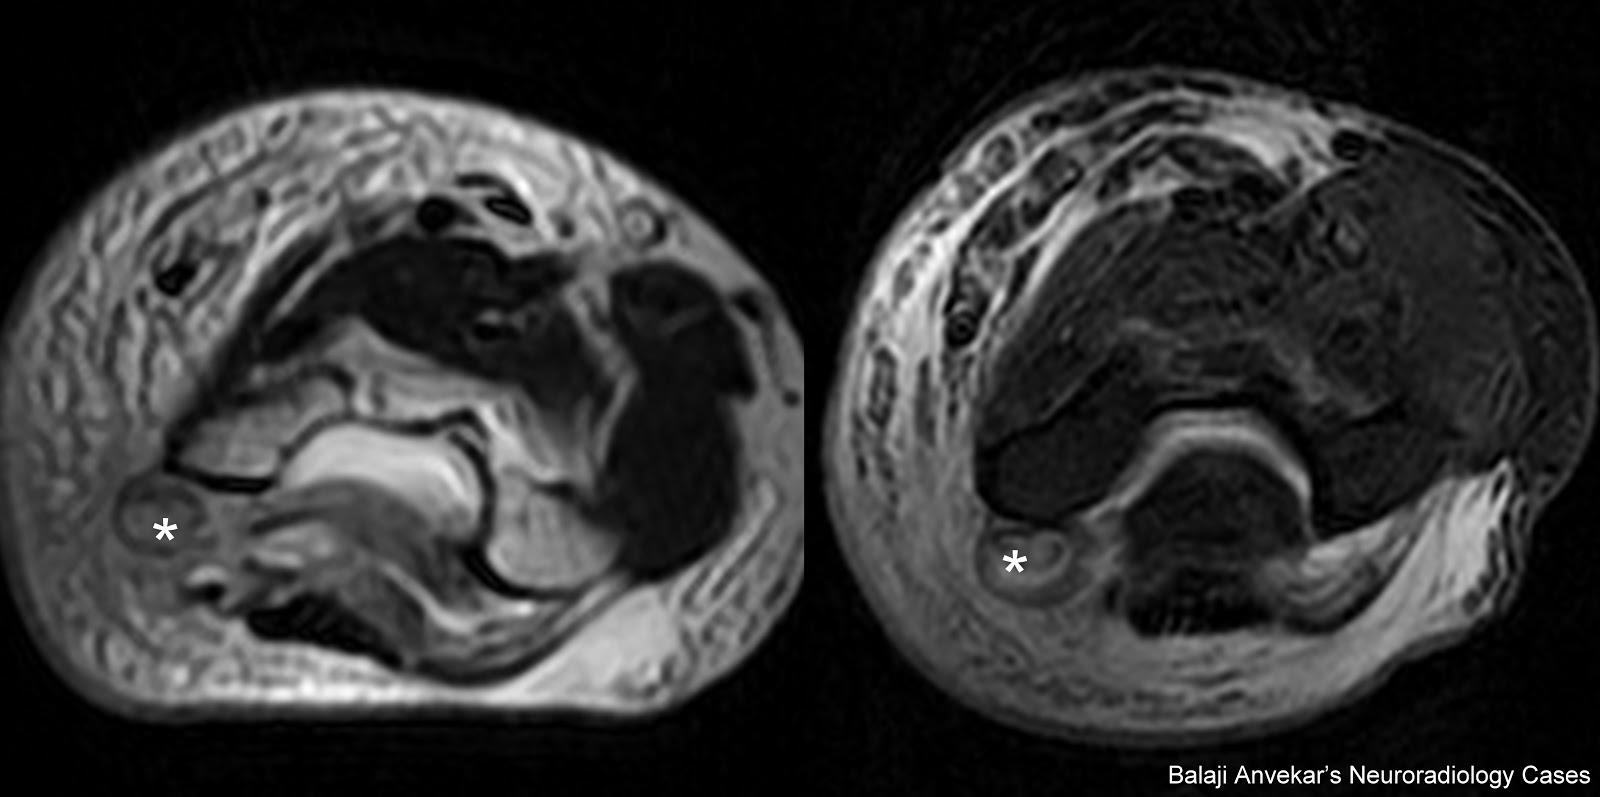 Dr Balaji Anvekar\'s Neuroradiology Cases: 01/11/12 - 01/12/12